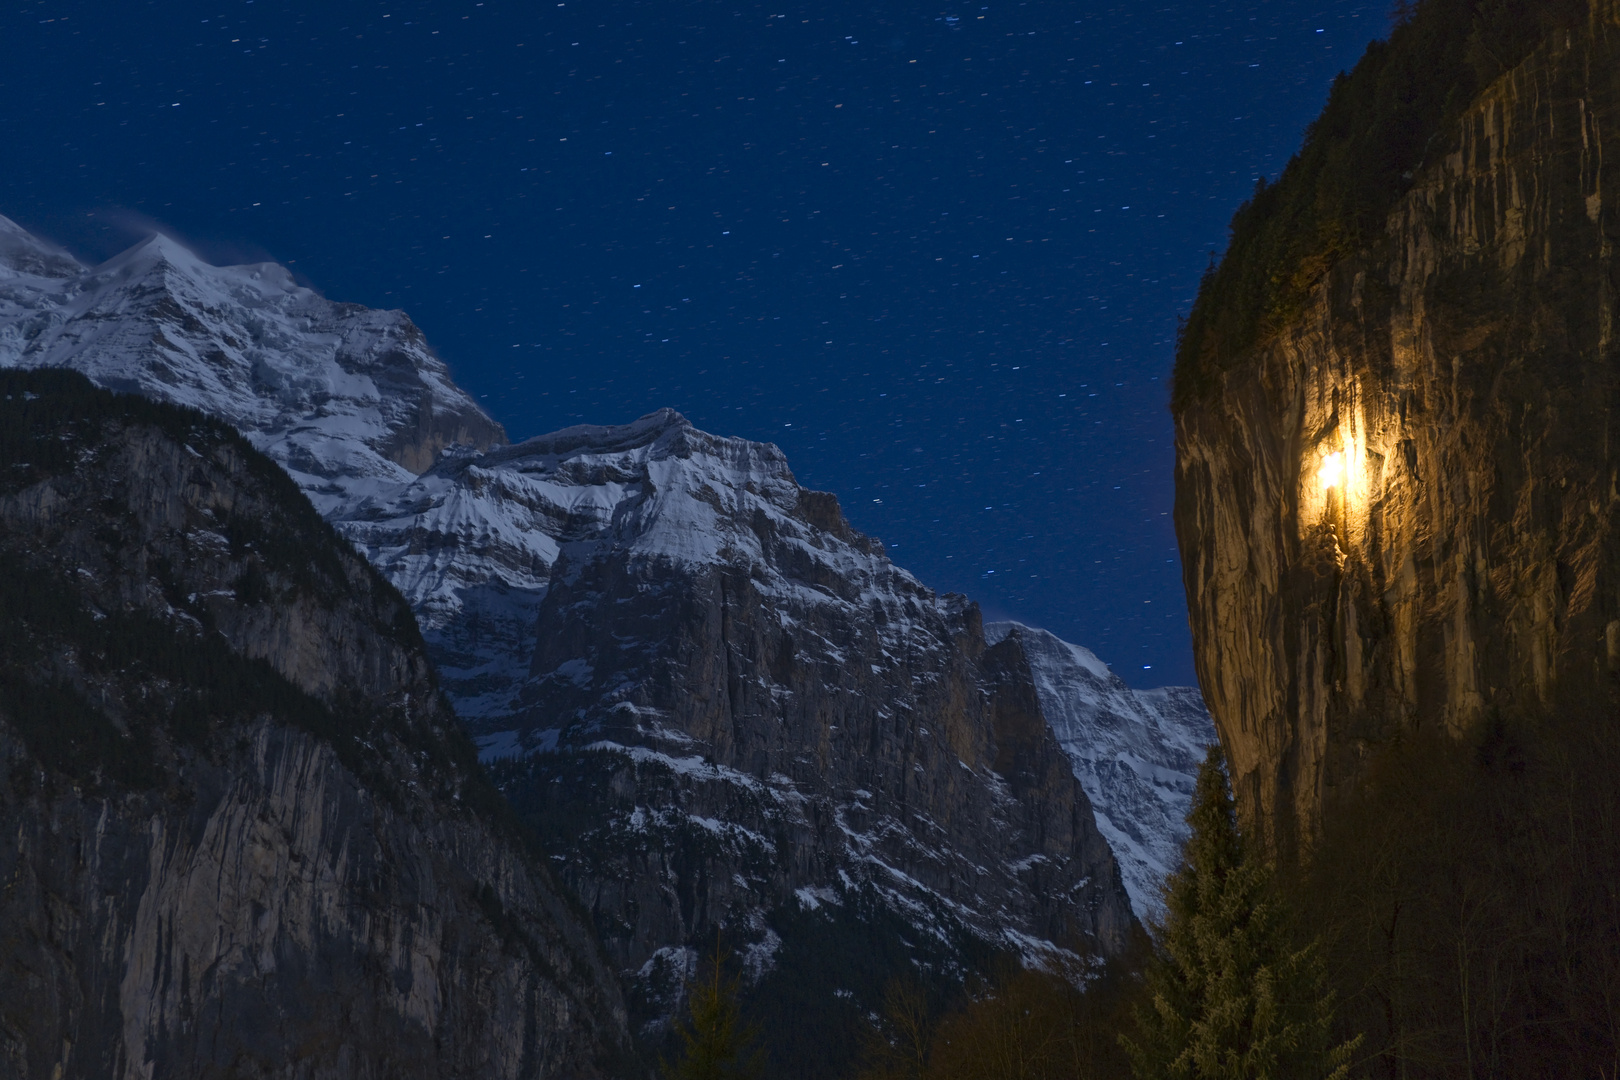 Lauterbrunnental Nights